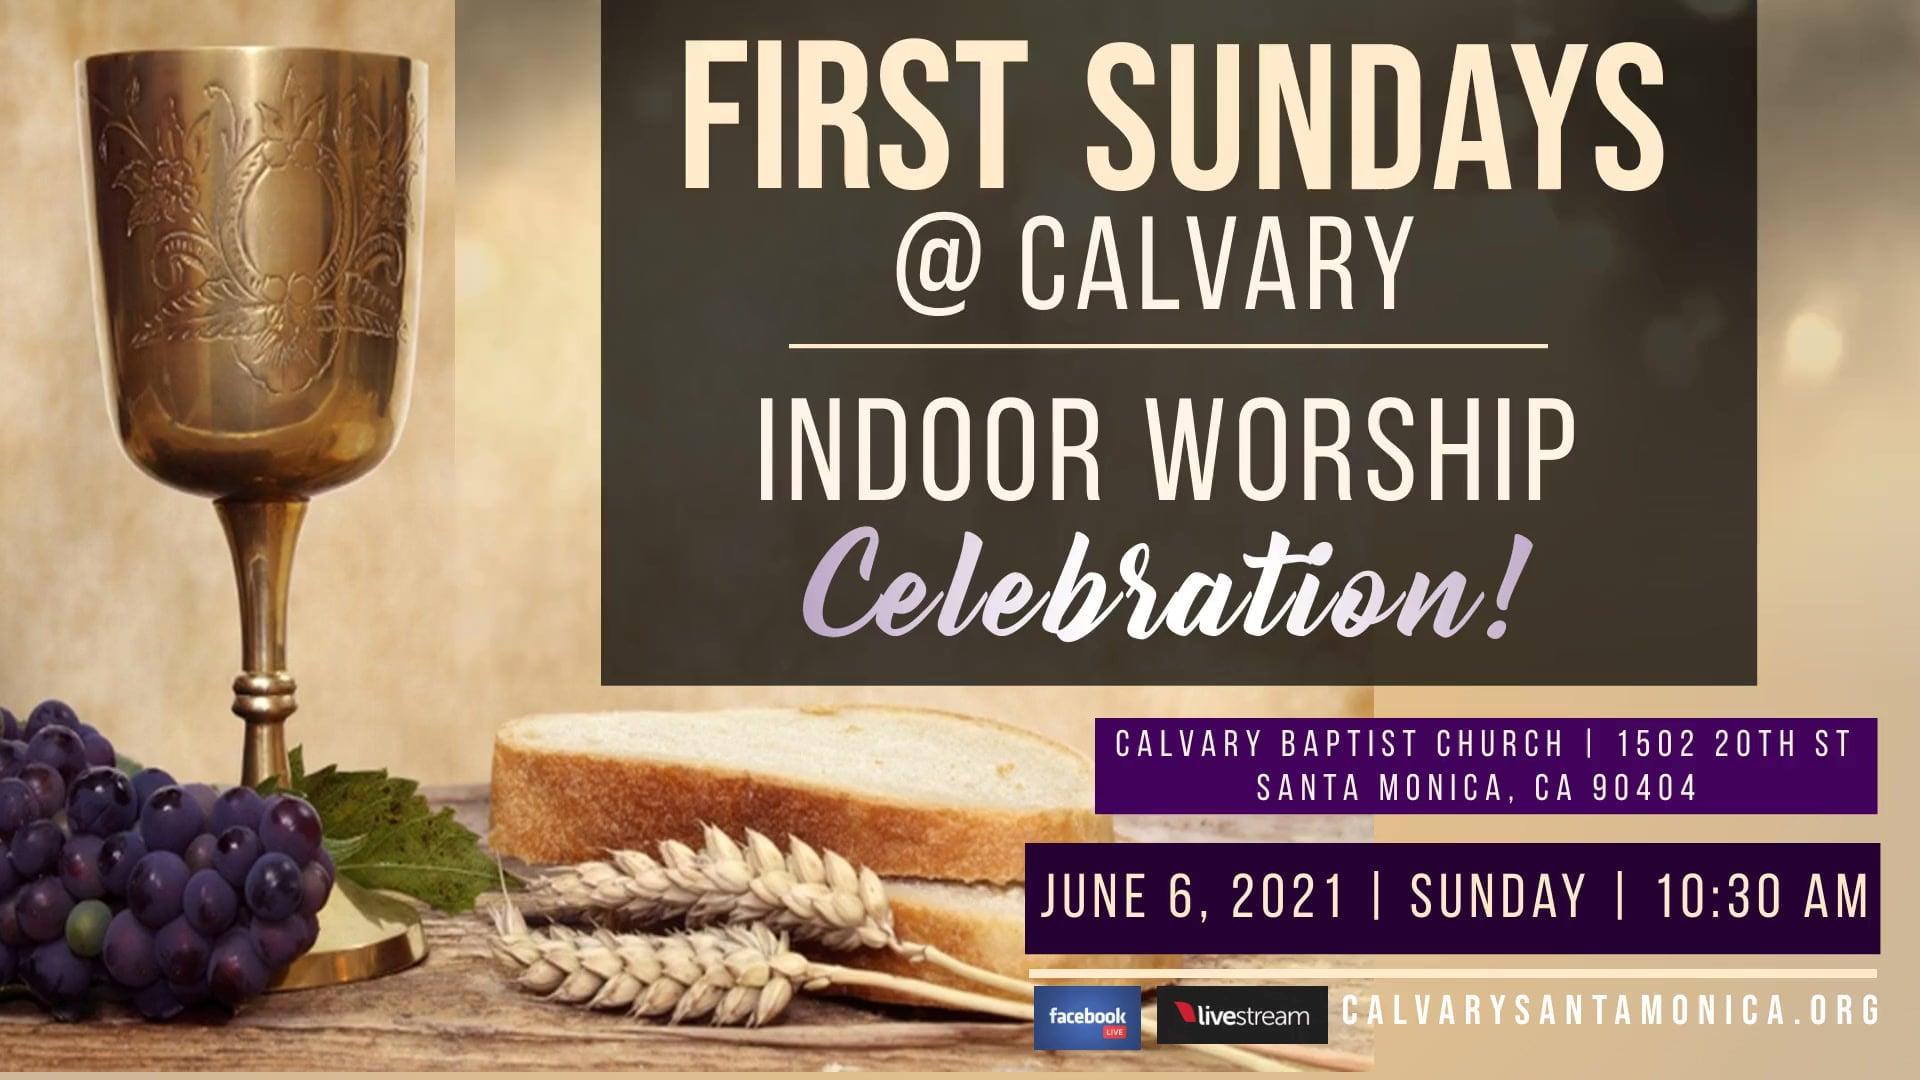 06.06.2021 Calvary Baptist Church Worship Service